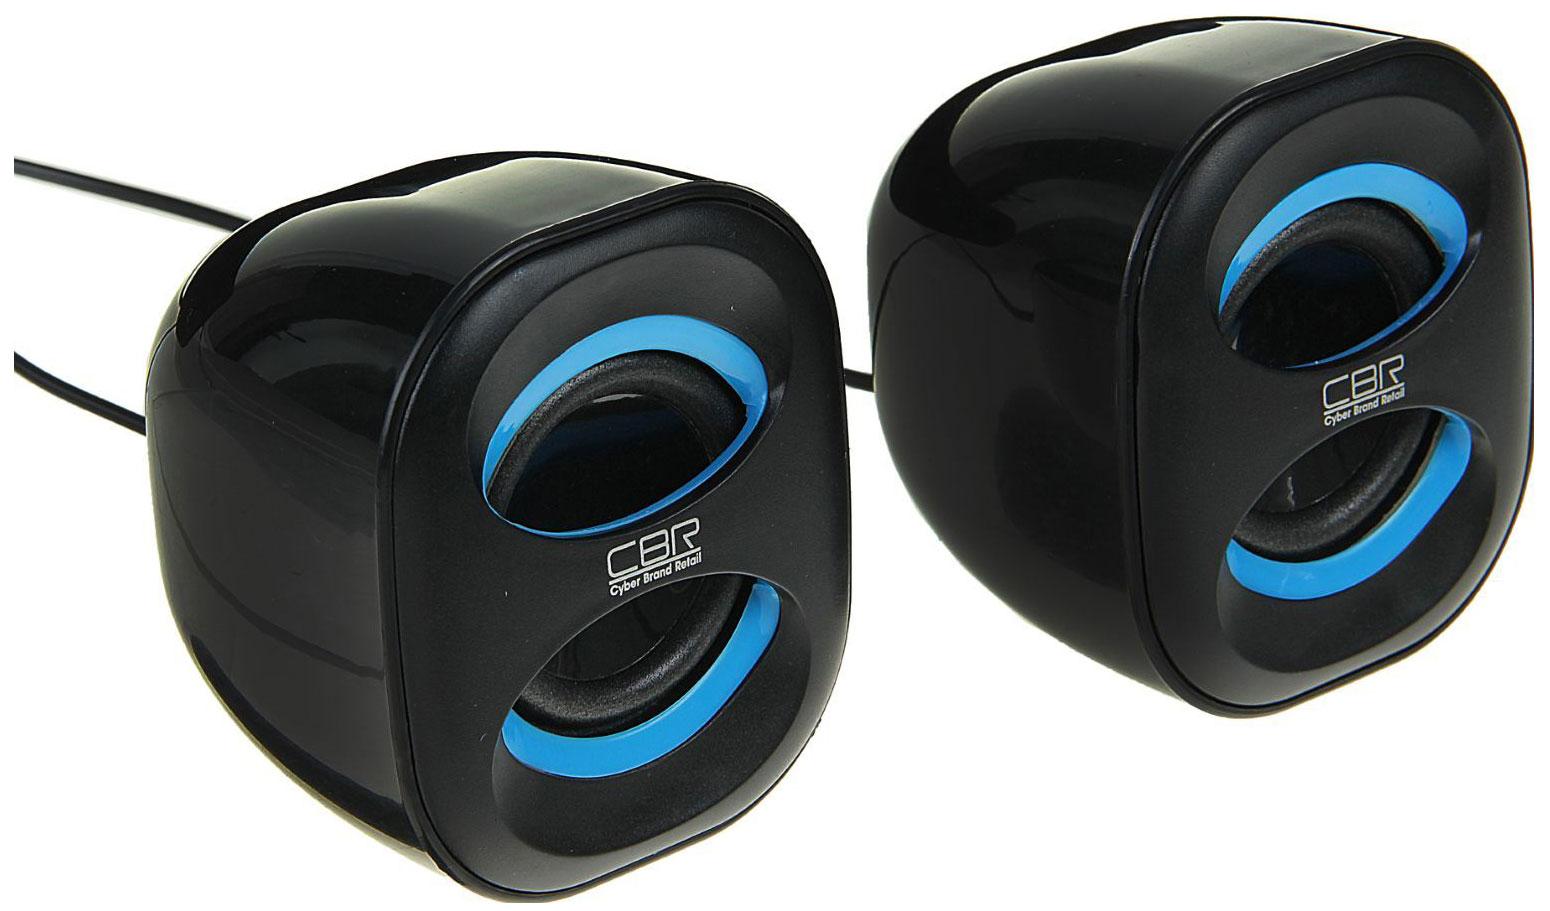 Колонки для компьютера CBR CMS 333 Синий/Black